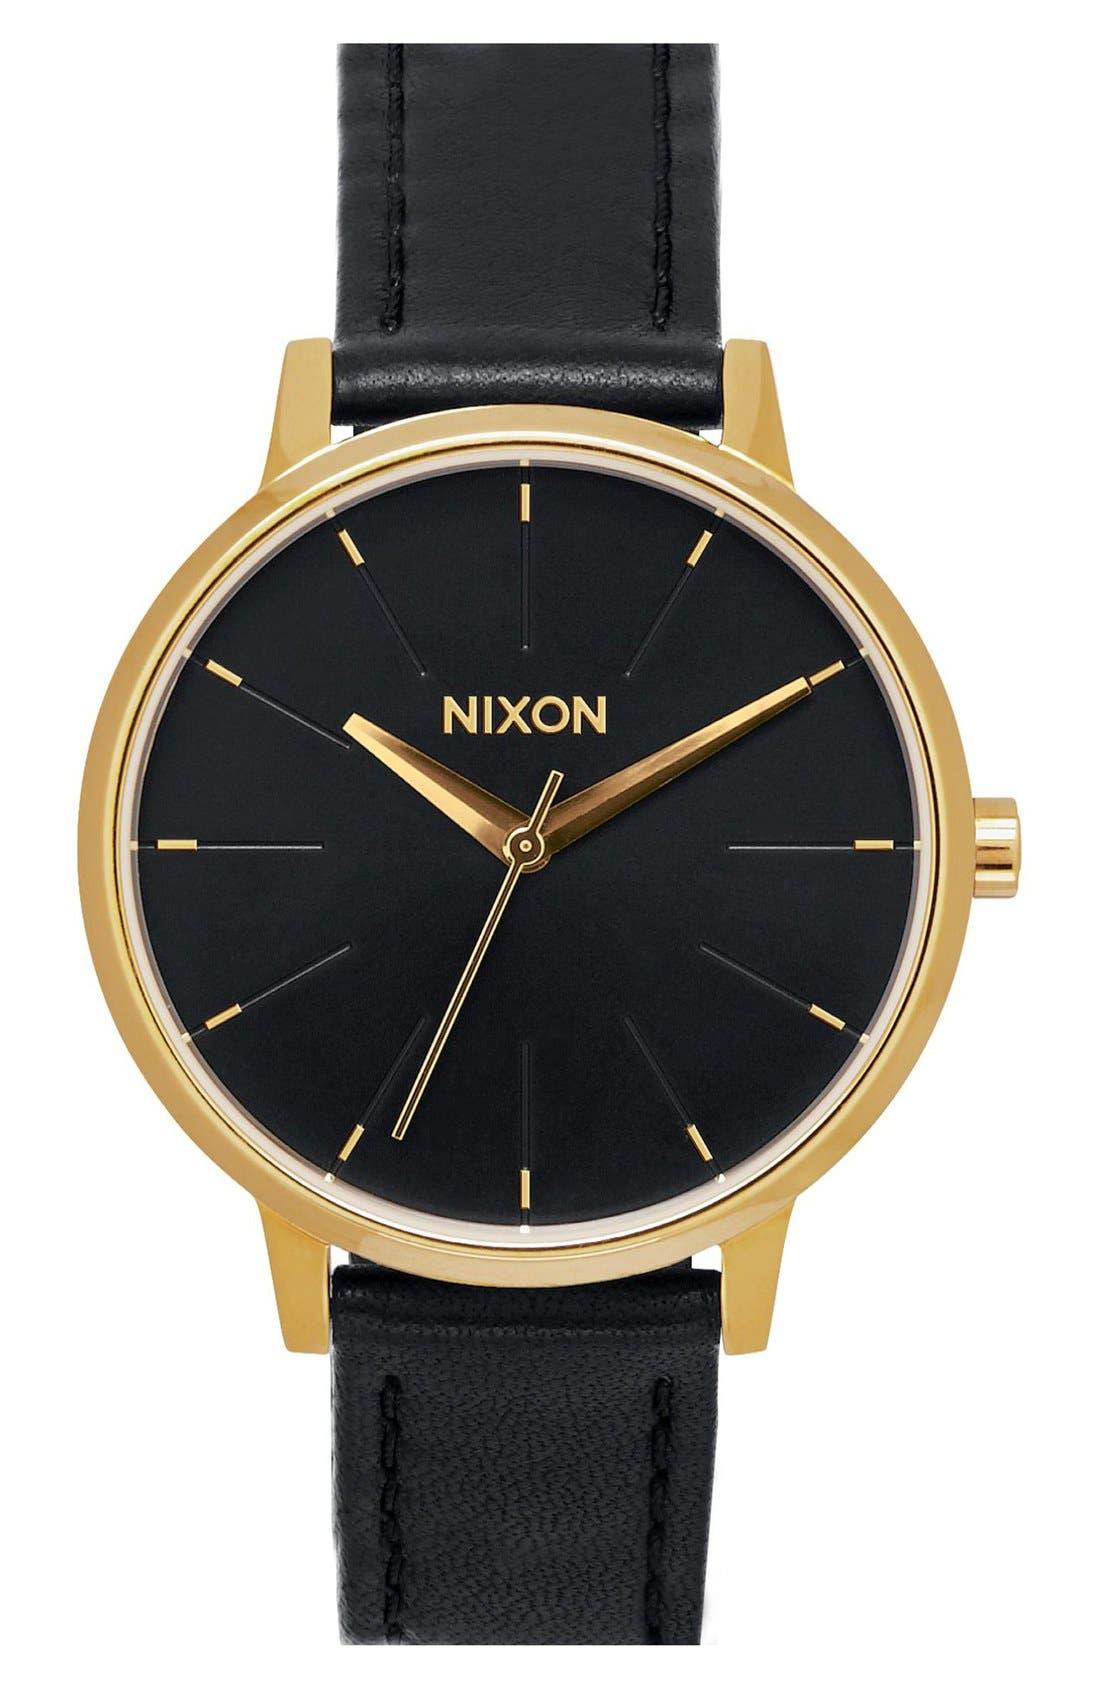 Main Image - Nixon 'The Kensington' Leather Strap Watch, 37mm